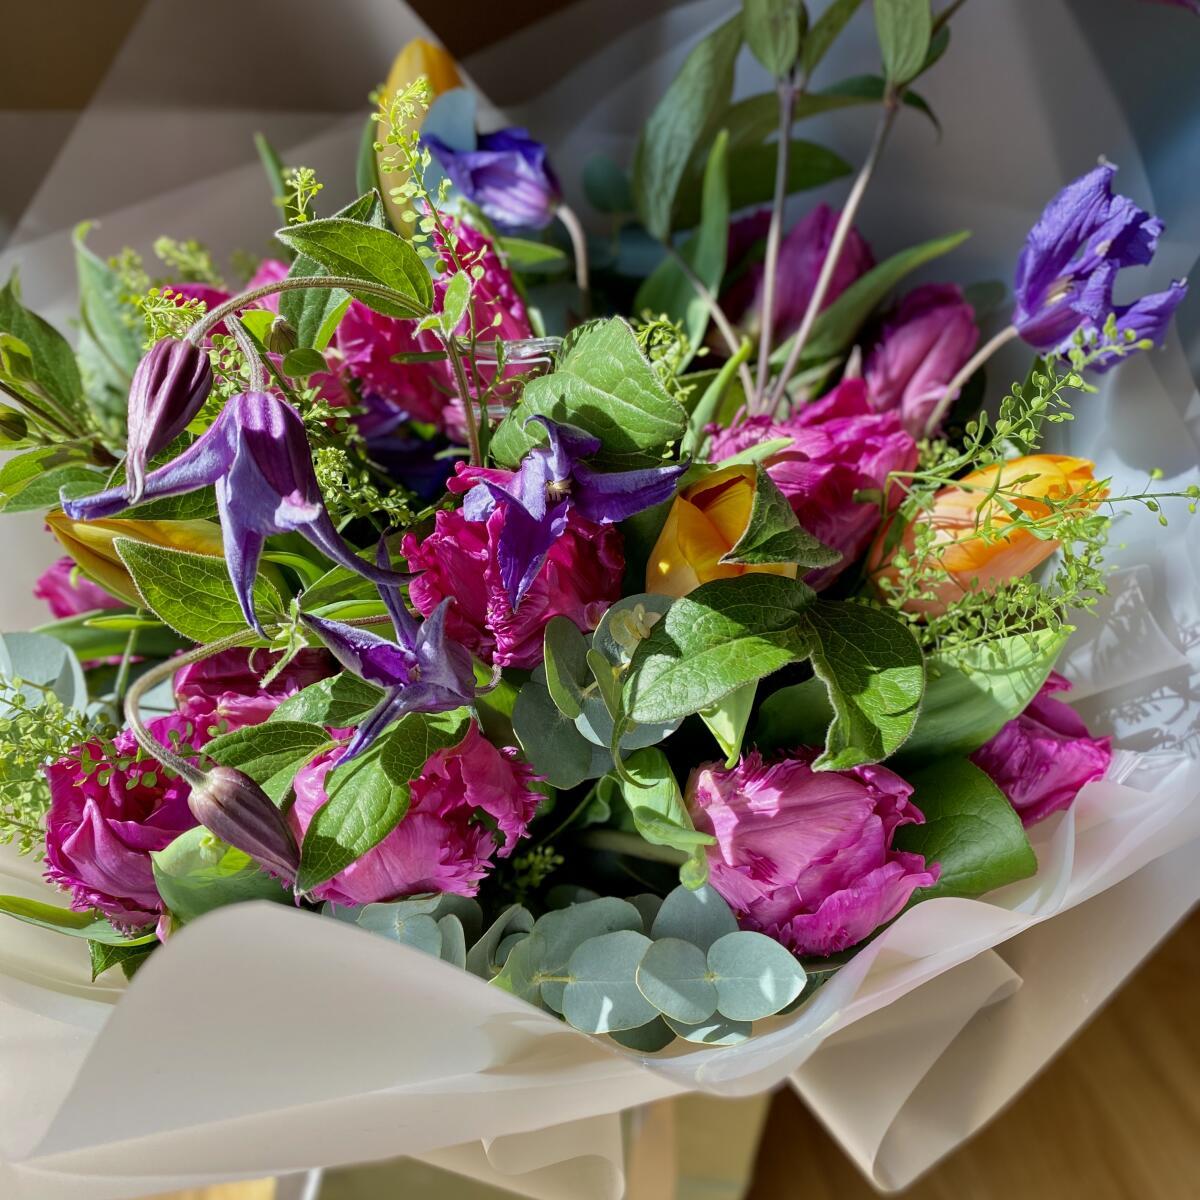 Verdure Floral Design Ltd 5 star review on 20th April 2020